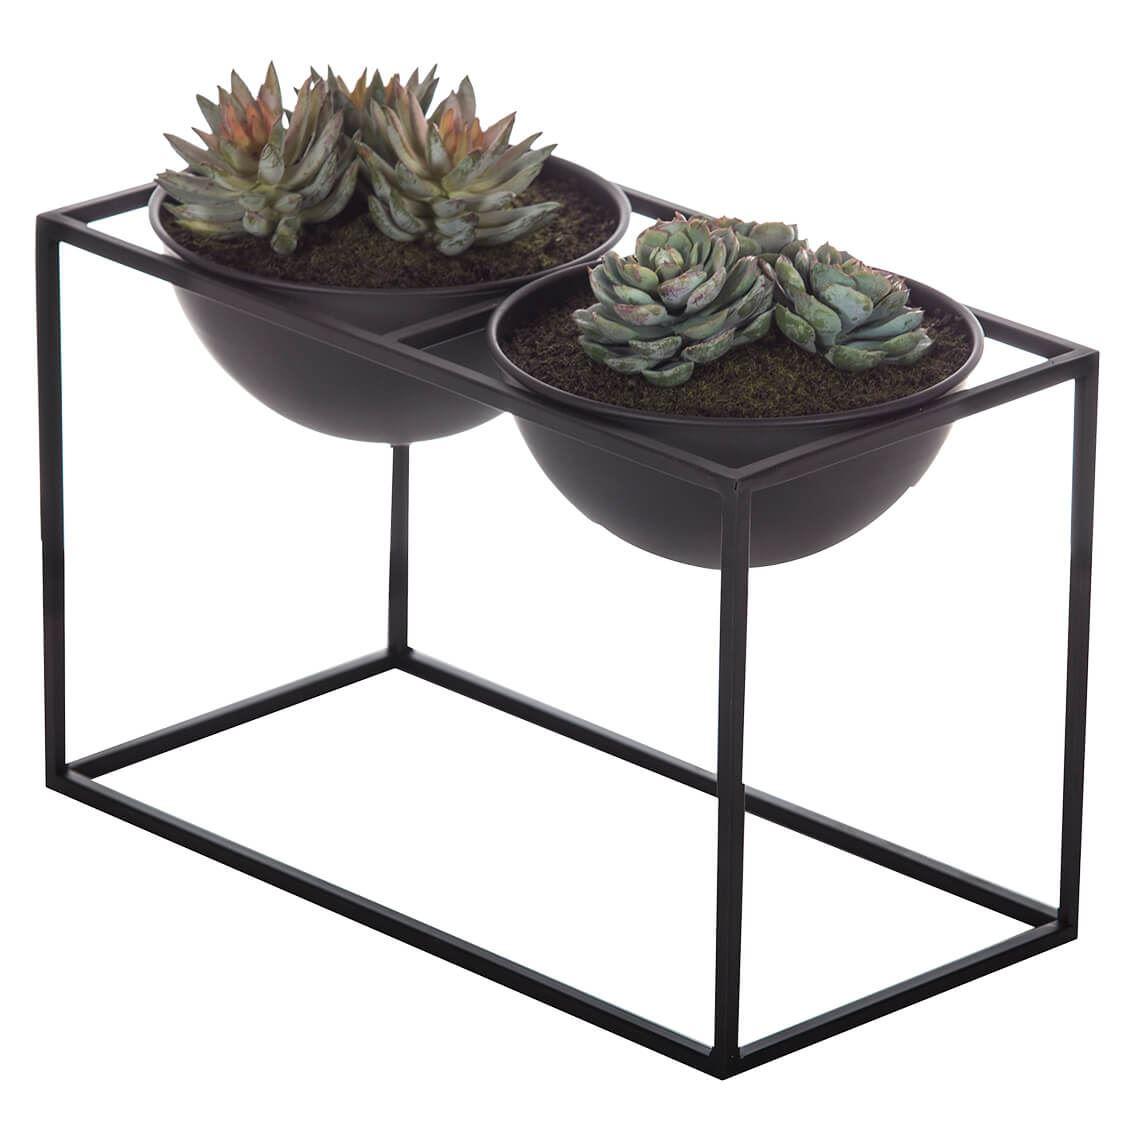 Echeveria Mix Rectangle Planter Size W 32cm x D 16cm x H 25cm in Black Freedom